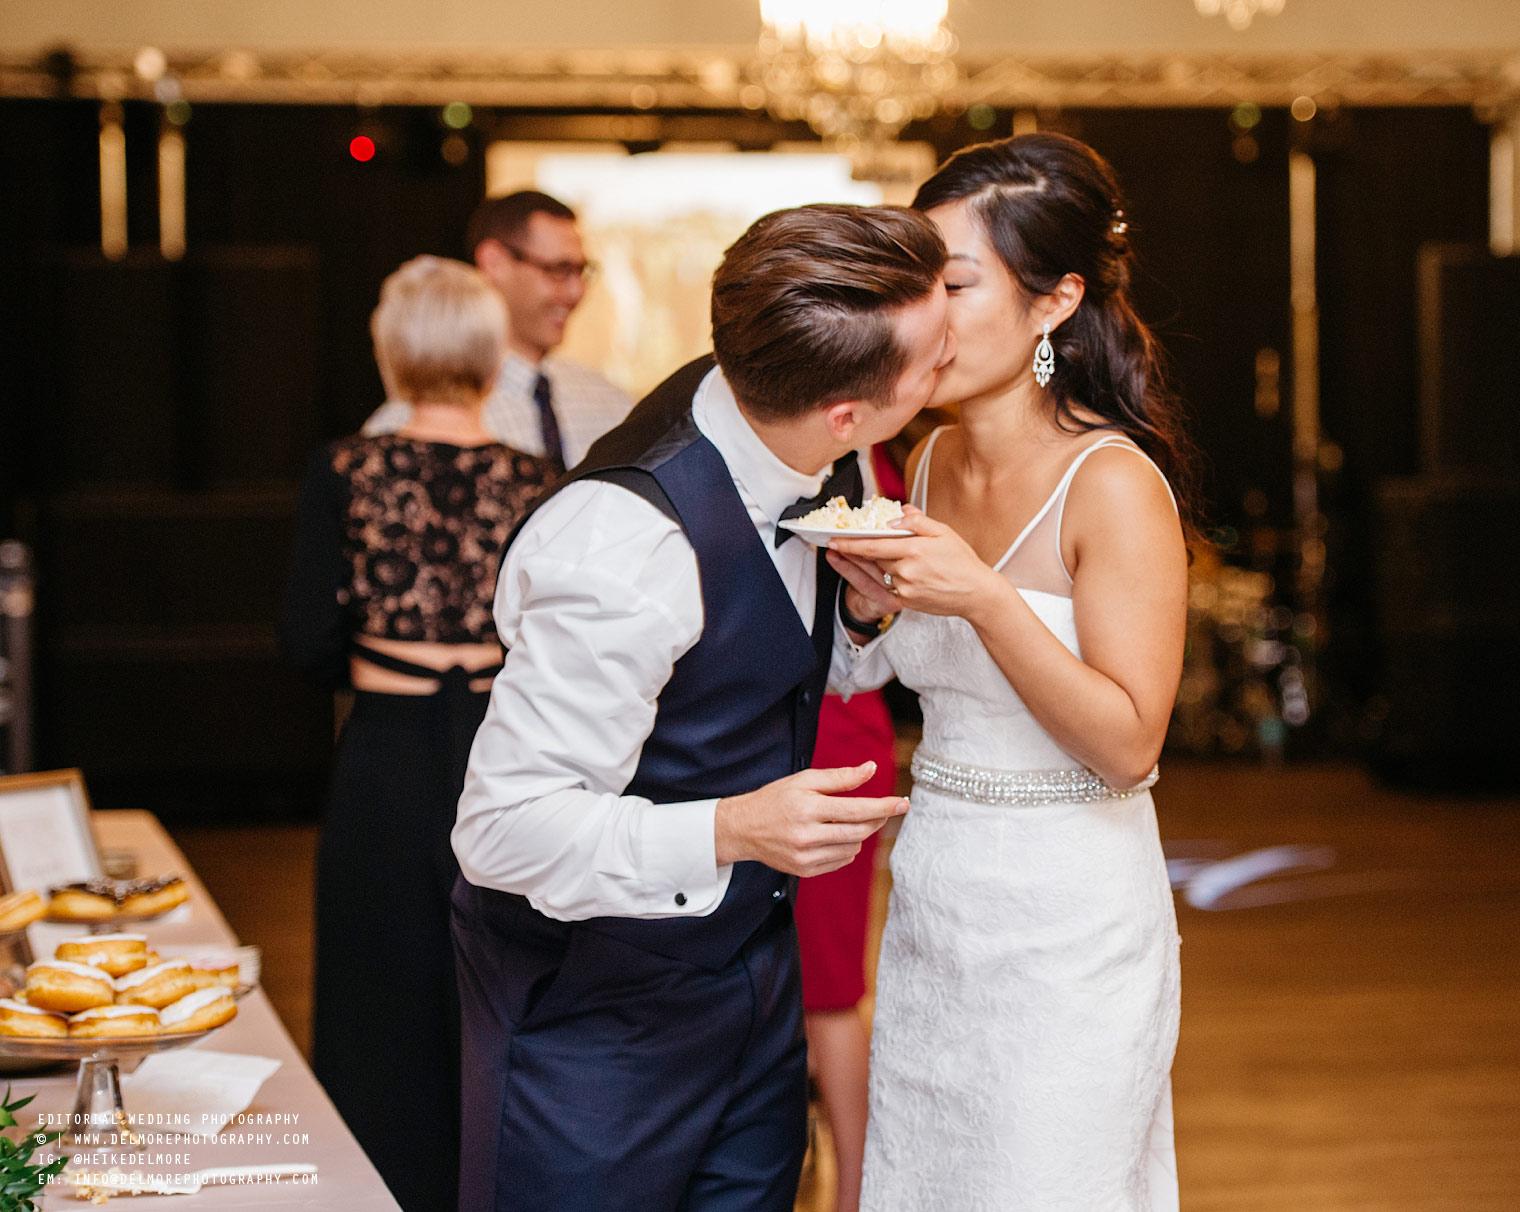 top-windsor-winery-wedding-photographer-065.jpg